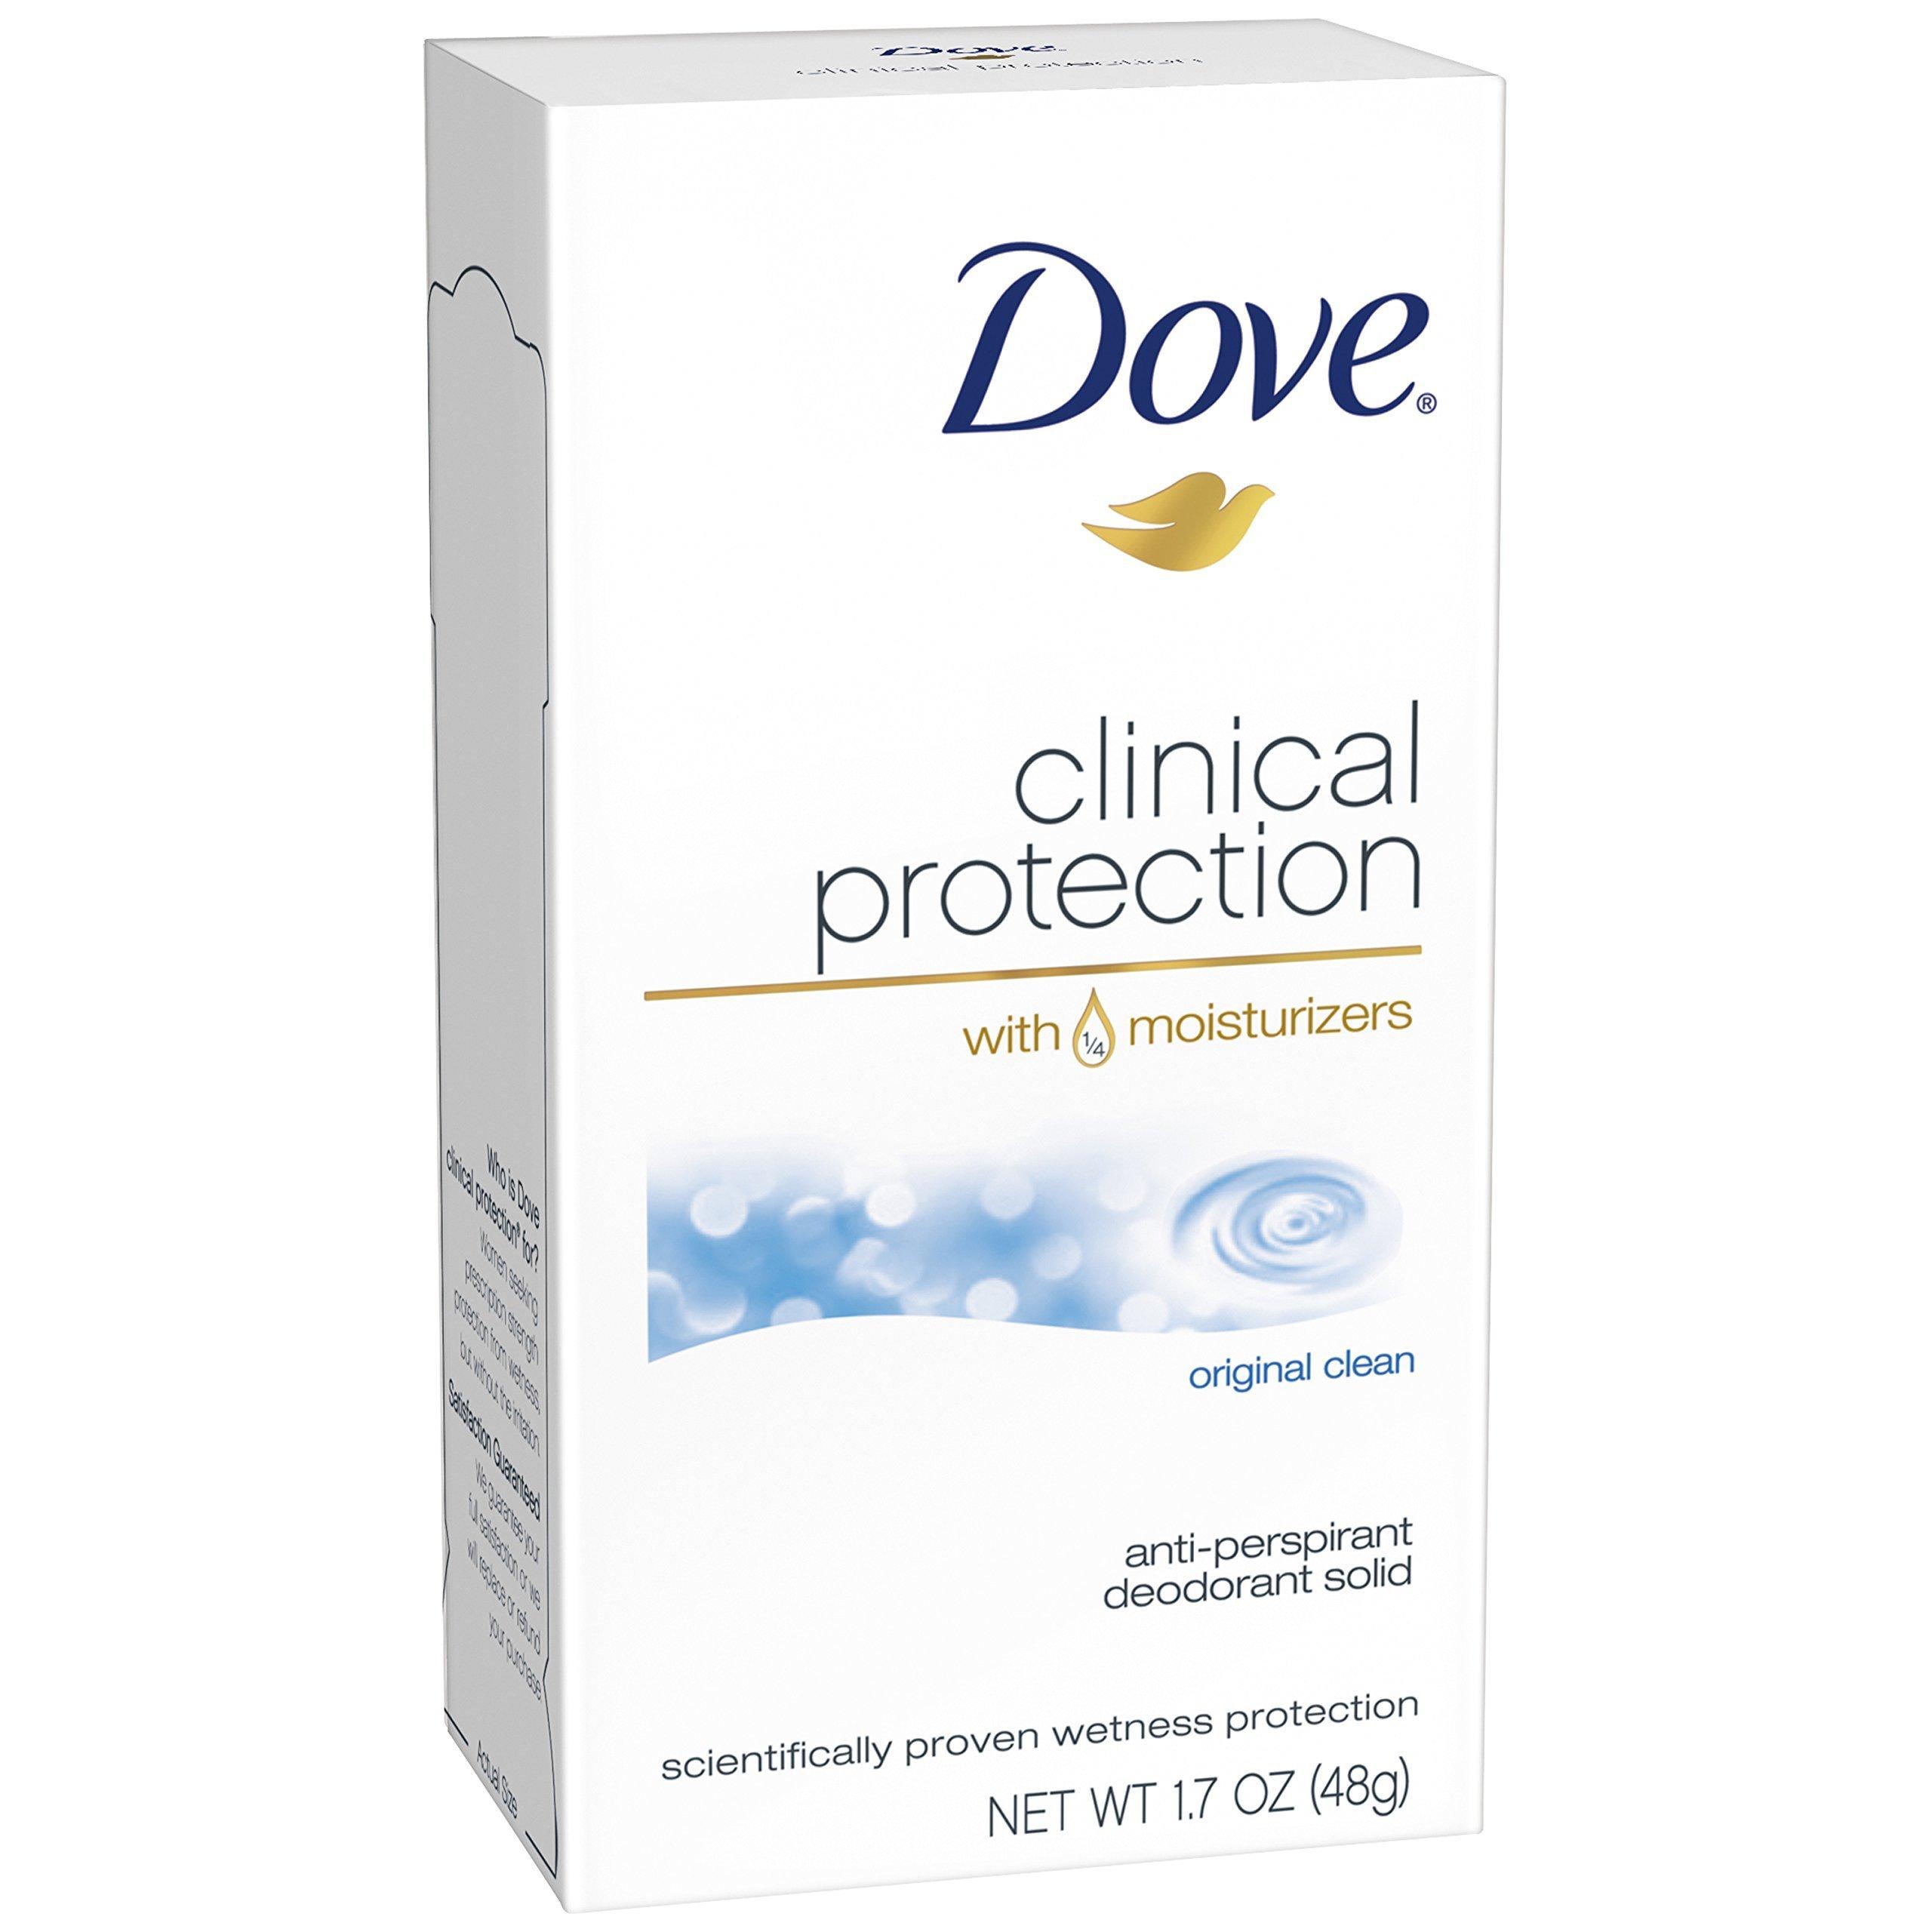 Dove Clinical Protection Antiperspirant Deodorant, Original Clean 1.7 oz